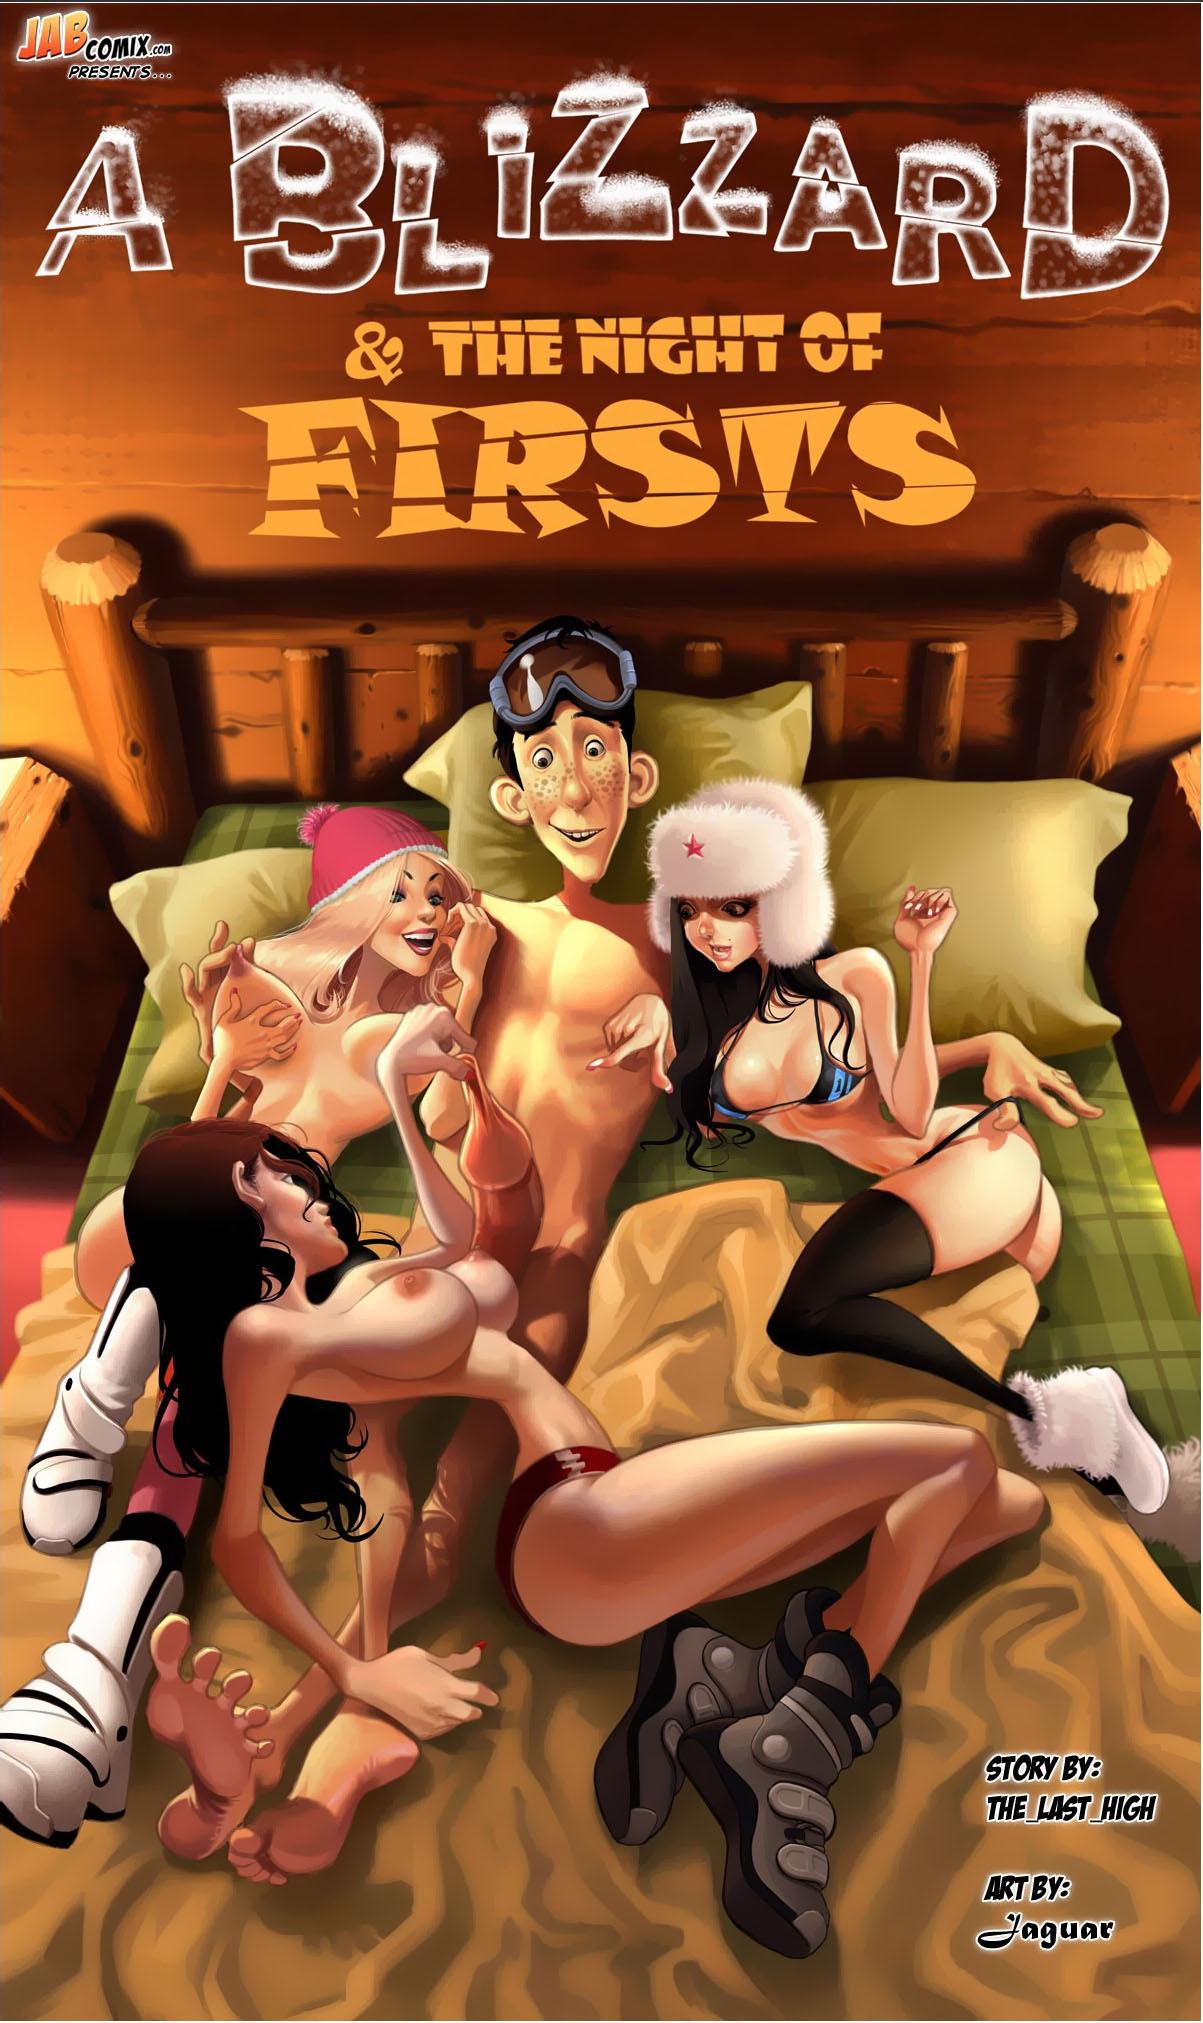 Porn Blizzars Free a blizzard & the night of firsts | jab comics | free porn